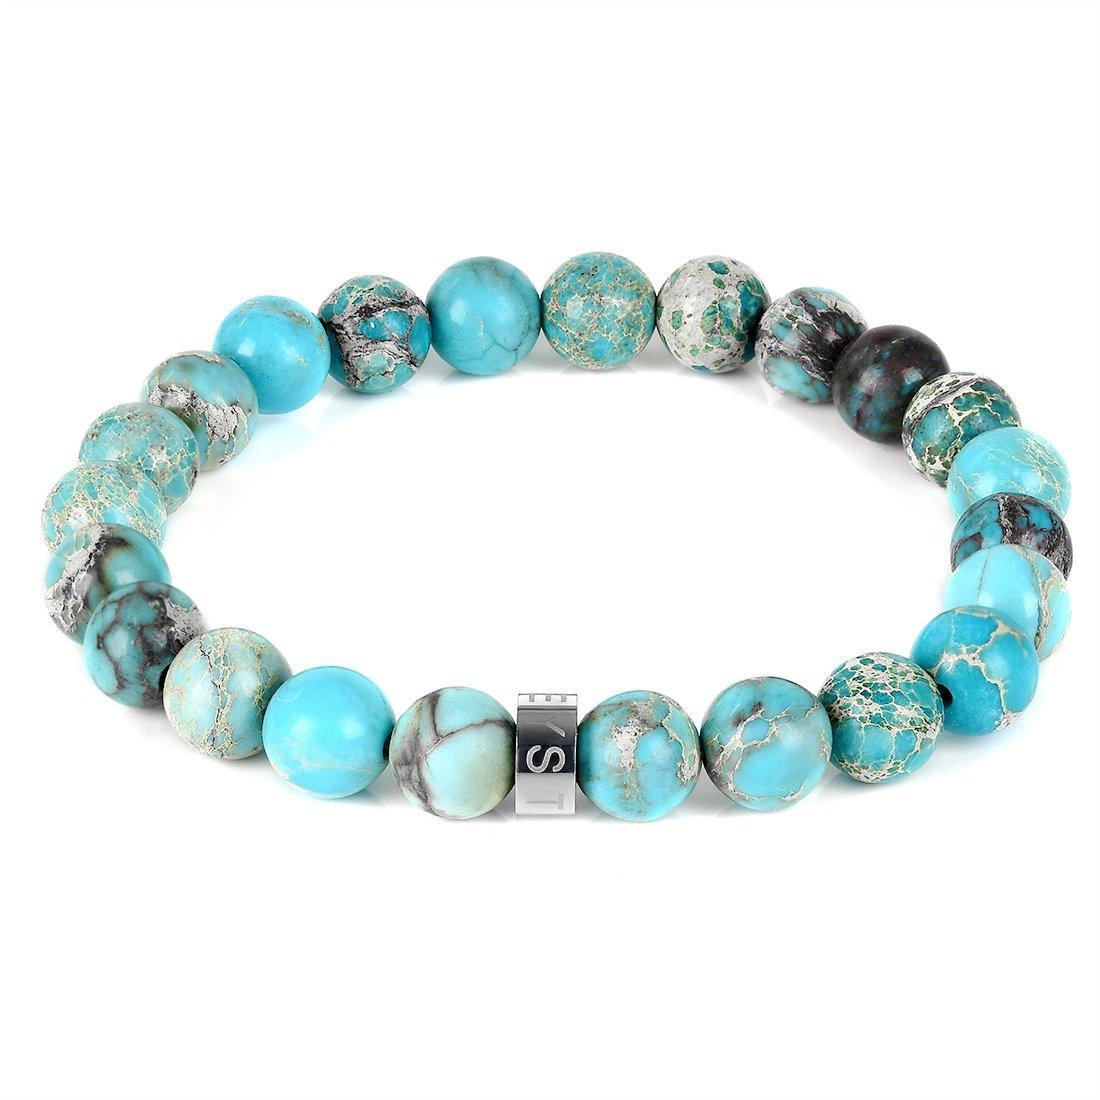 Three Keys Jewelry 8mm Blue Sea Sediment Chrismatite Beads Bracelet Handmade Healing Beads Meditation Energy Stretch Bracelet Unisex 7'' GB-004